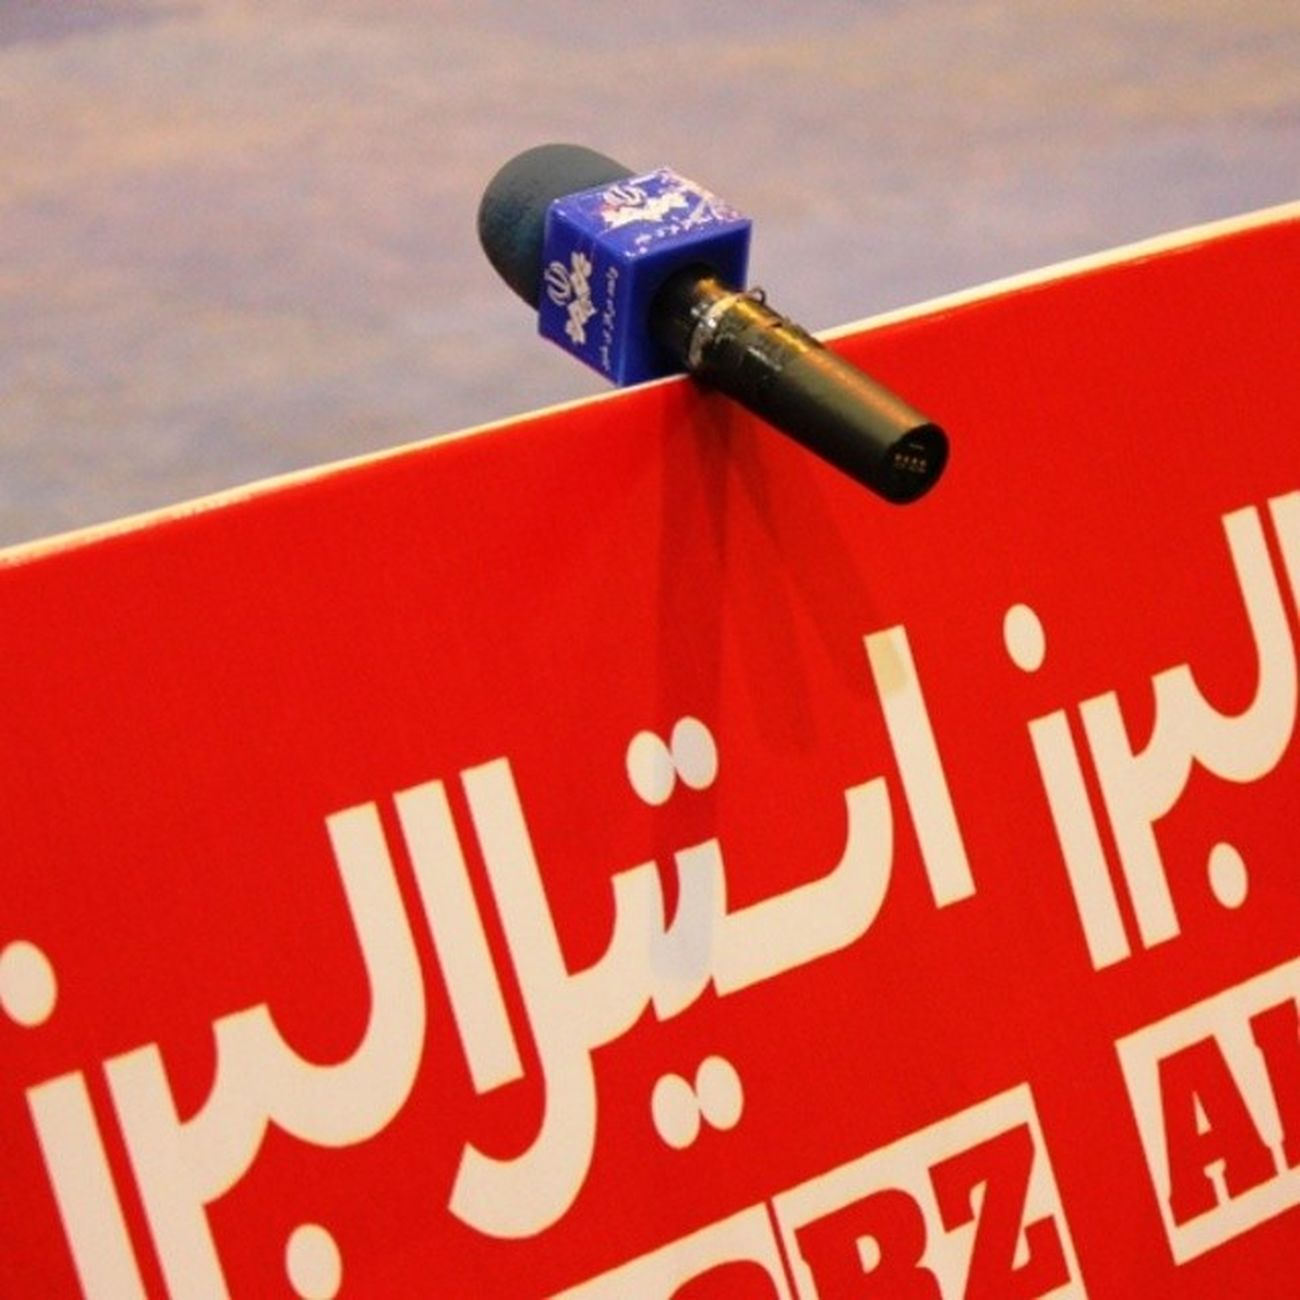 Steel Alborz Fajr Cup Tkdteakwondow ;-)